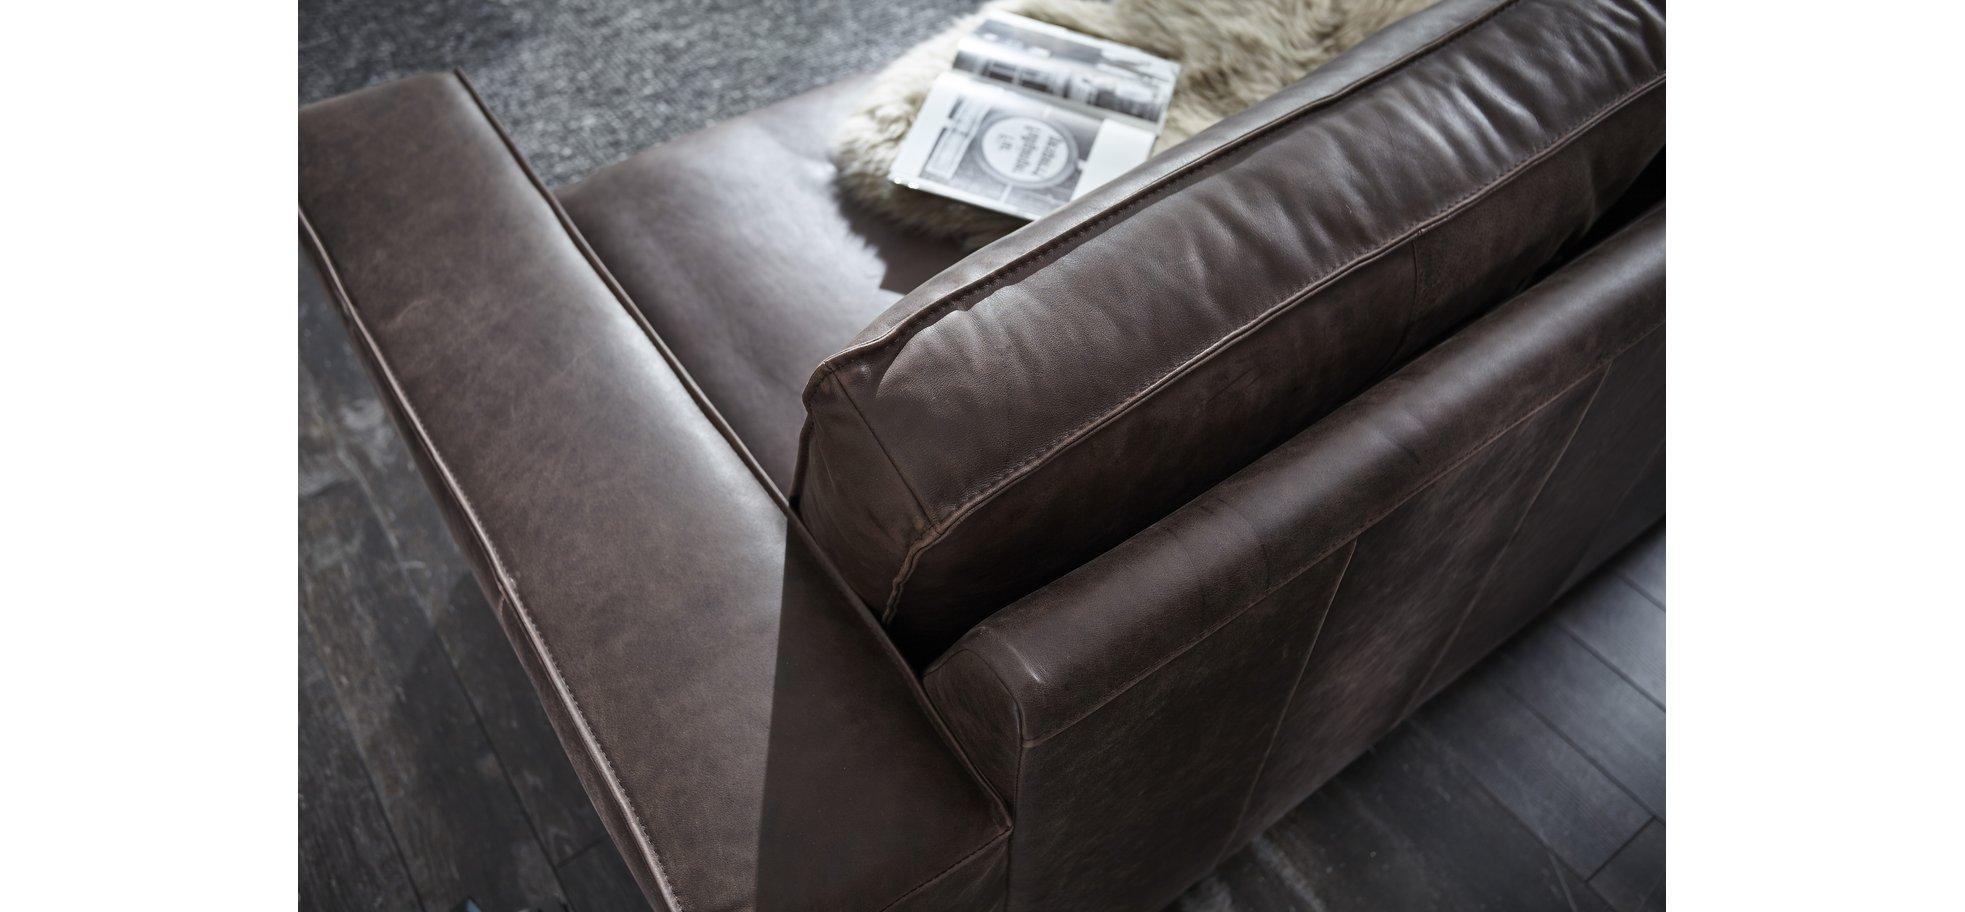 Full Size of Natura Sofa Love Couch Kansas Denver Newport Gebraucht Livingston Pasadena Brooklyn Einzelsofa In 2 Gren 3 Sitzer Polster Chippendale Reinigen 3er Big L Form Sofa Natura Sofa